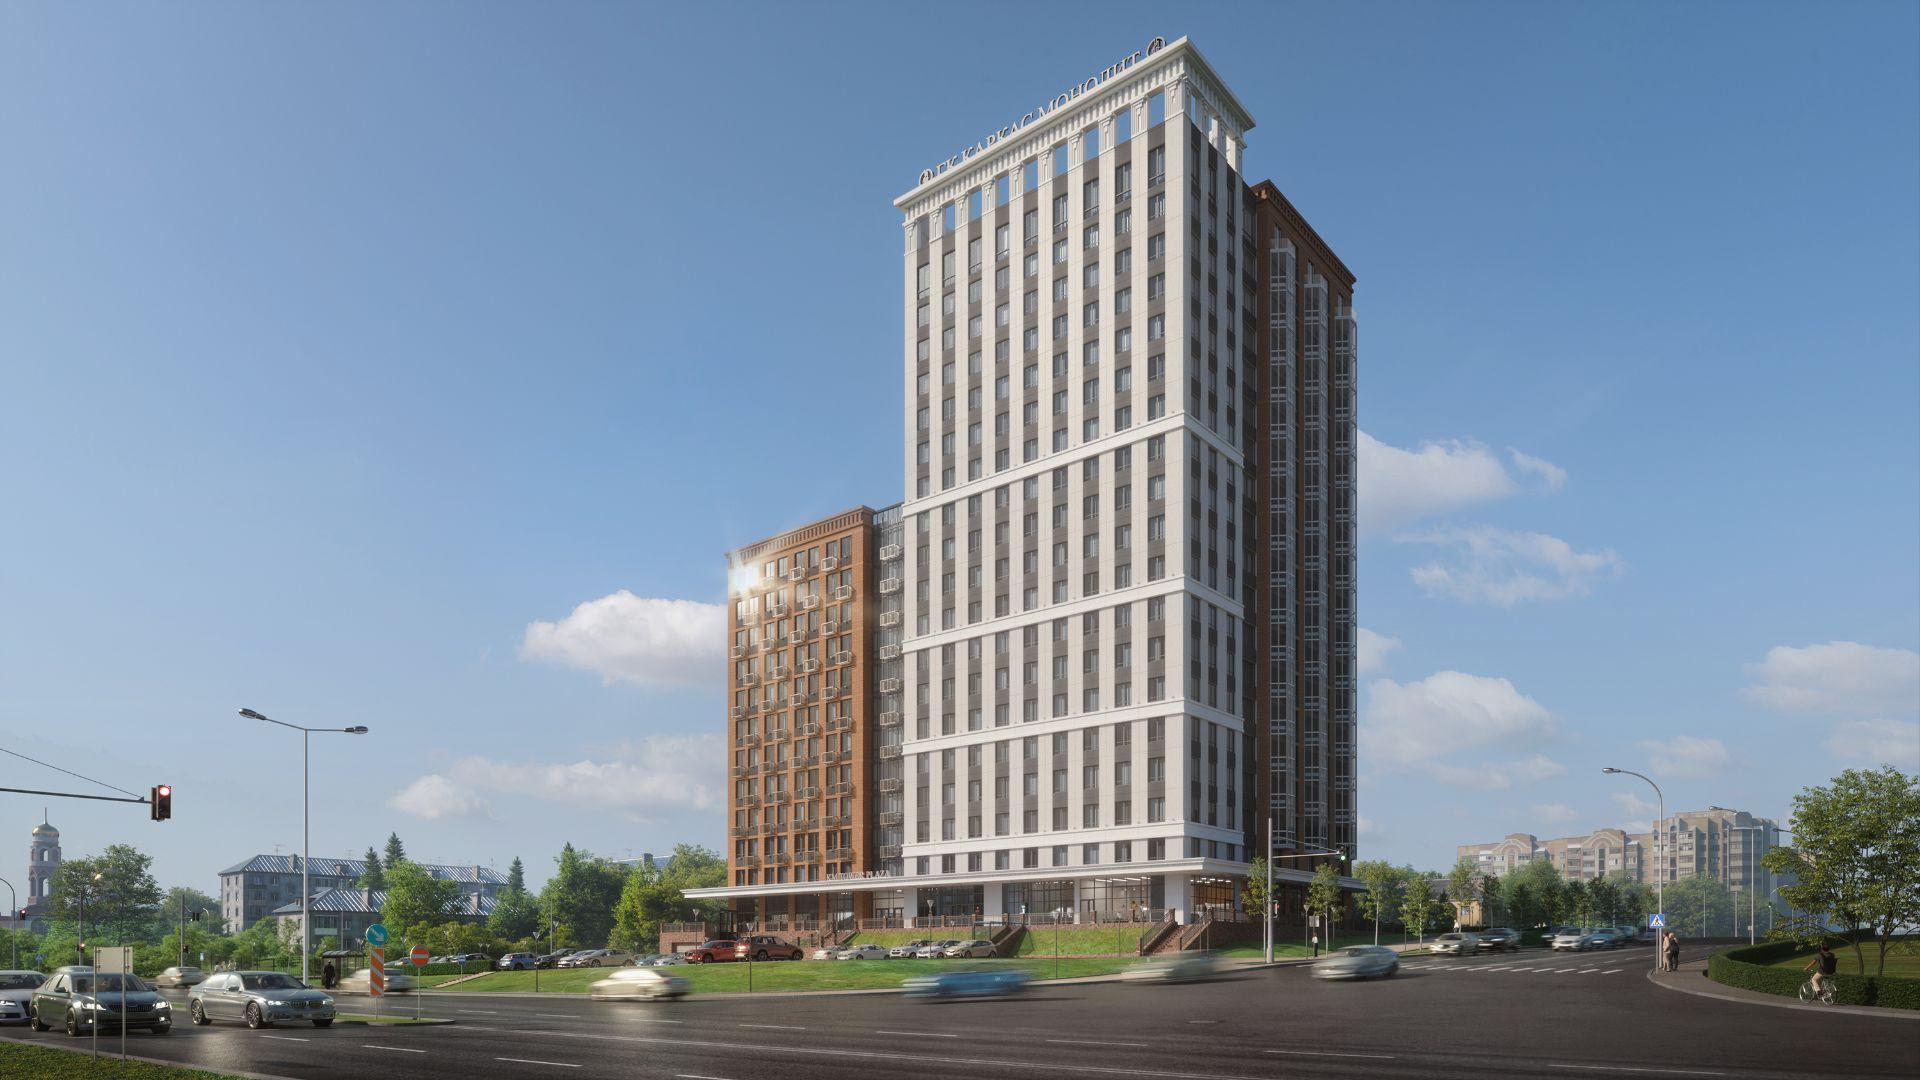 ЖК Апарт-комплекс KM Tower Plaza (Апарт-комплекс КМ Тауэр Плаза)